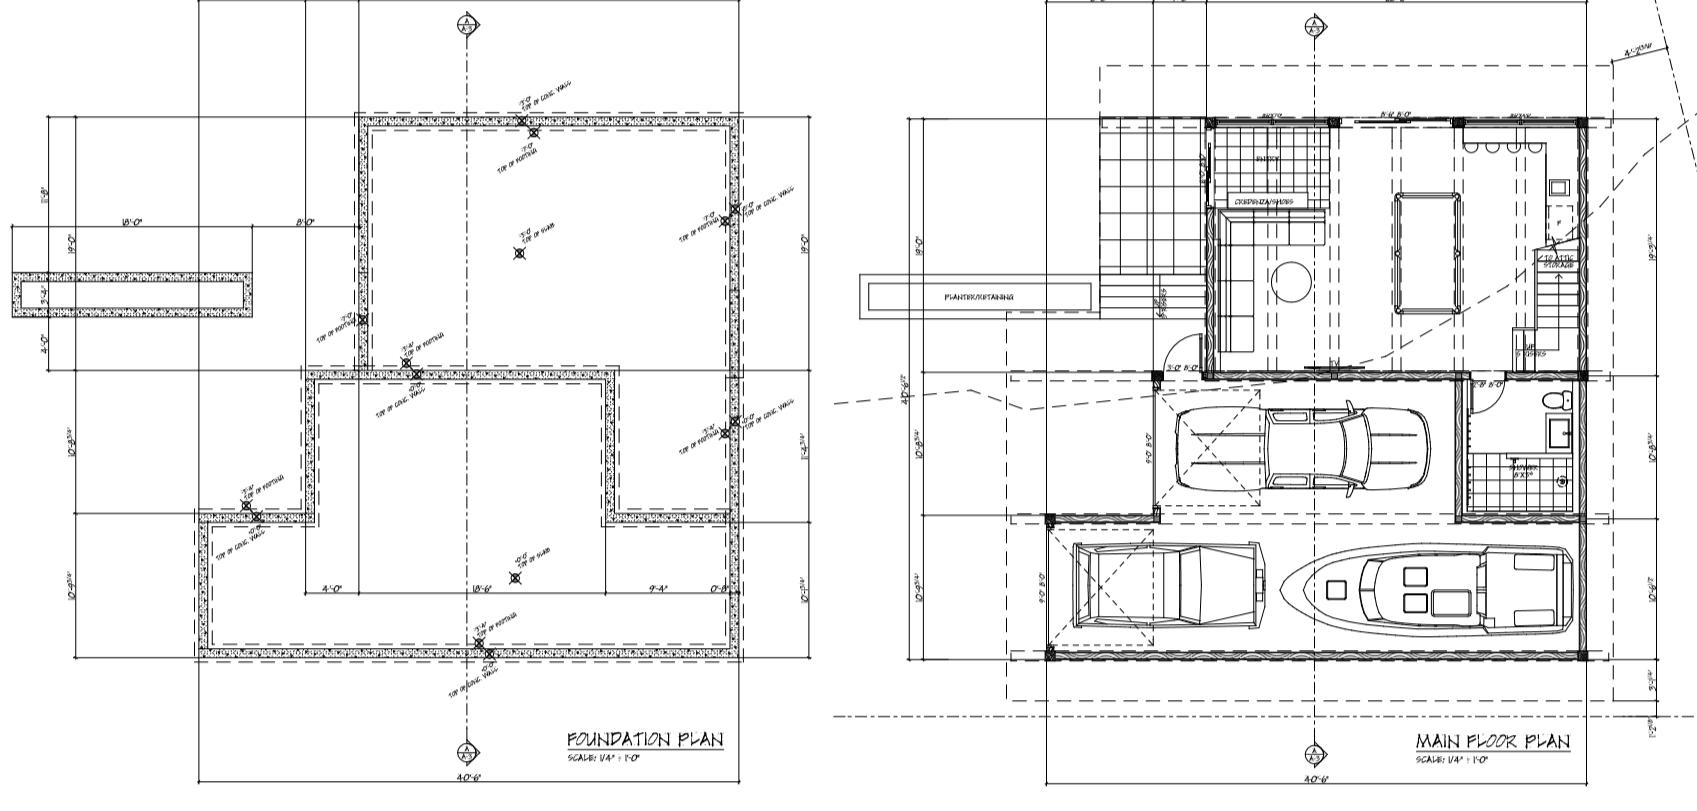 Intial Planning + Design